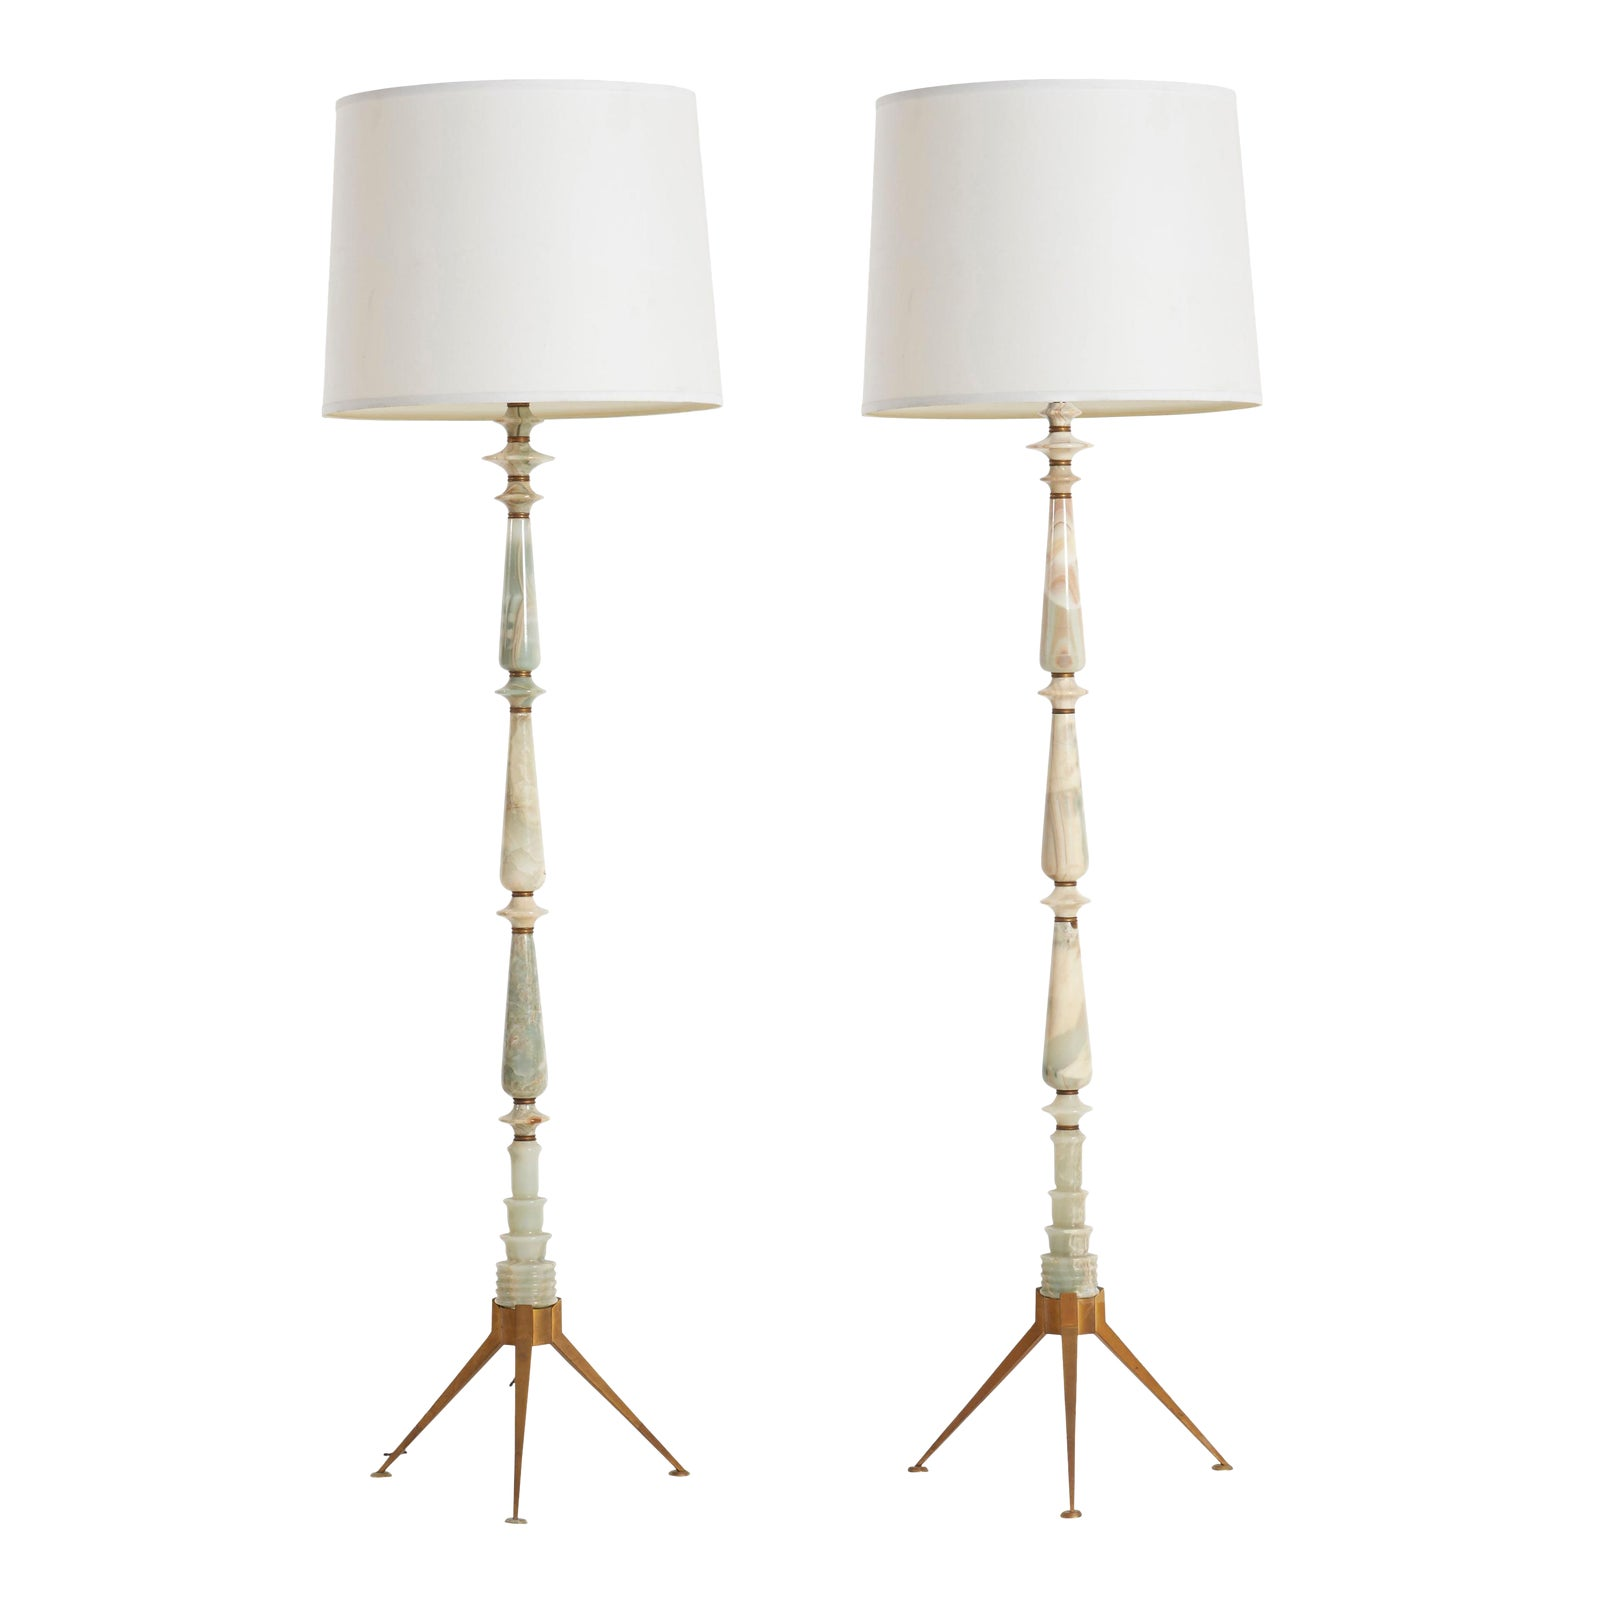 Pair Of Ico Parisi Style Onyx Floor Lamps Chairish